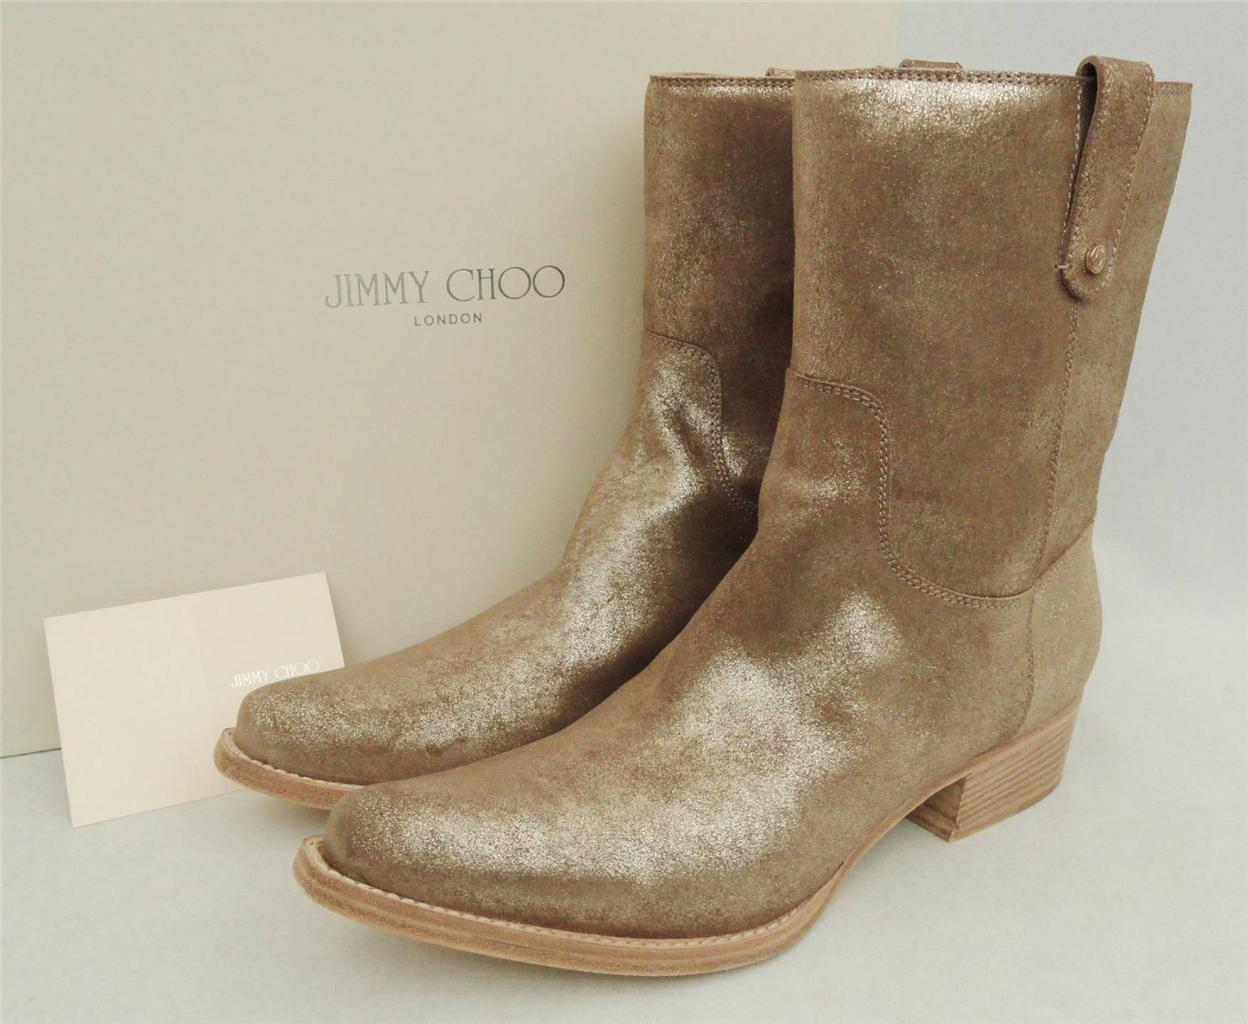 Jimmy Choo Gold UK8 Cowgirl Stiefel schuhe UK8 Gold EU41 590GBP Great Gift 2760d6